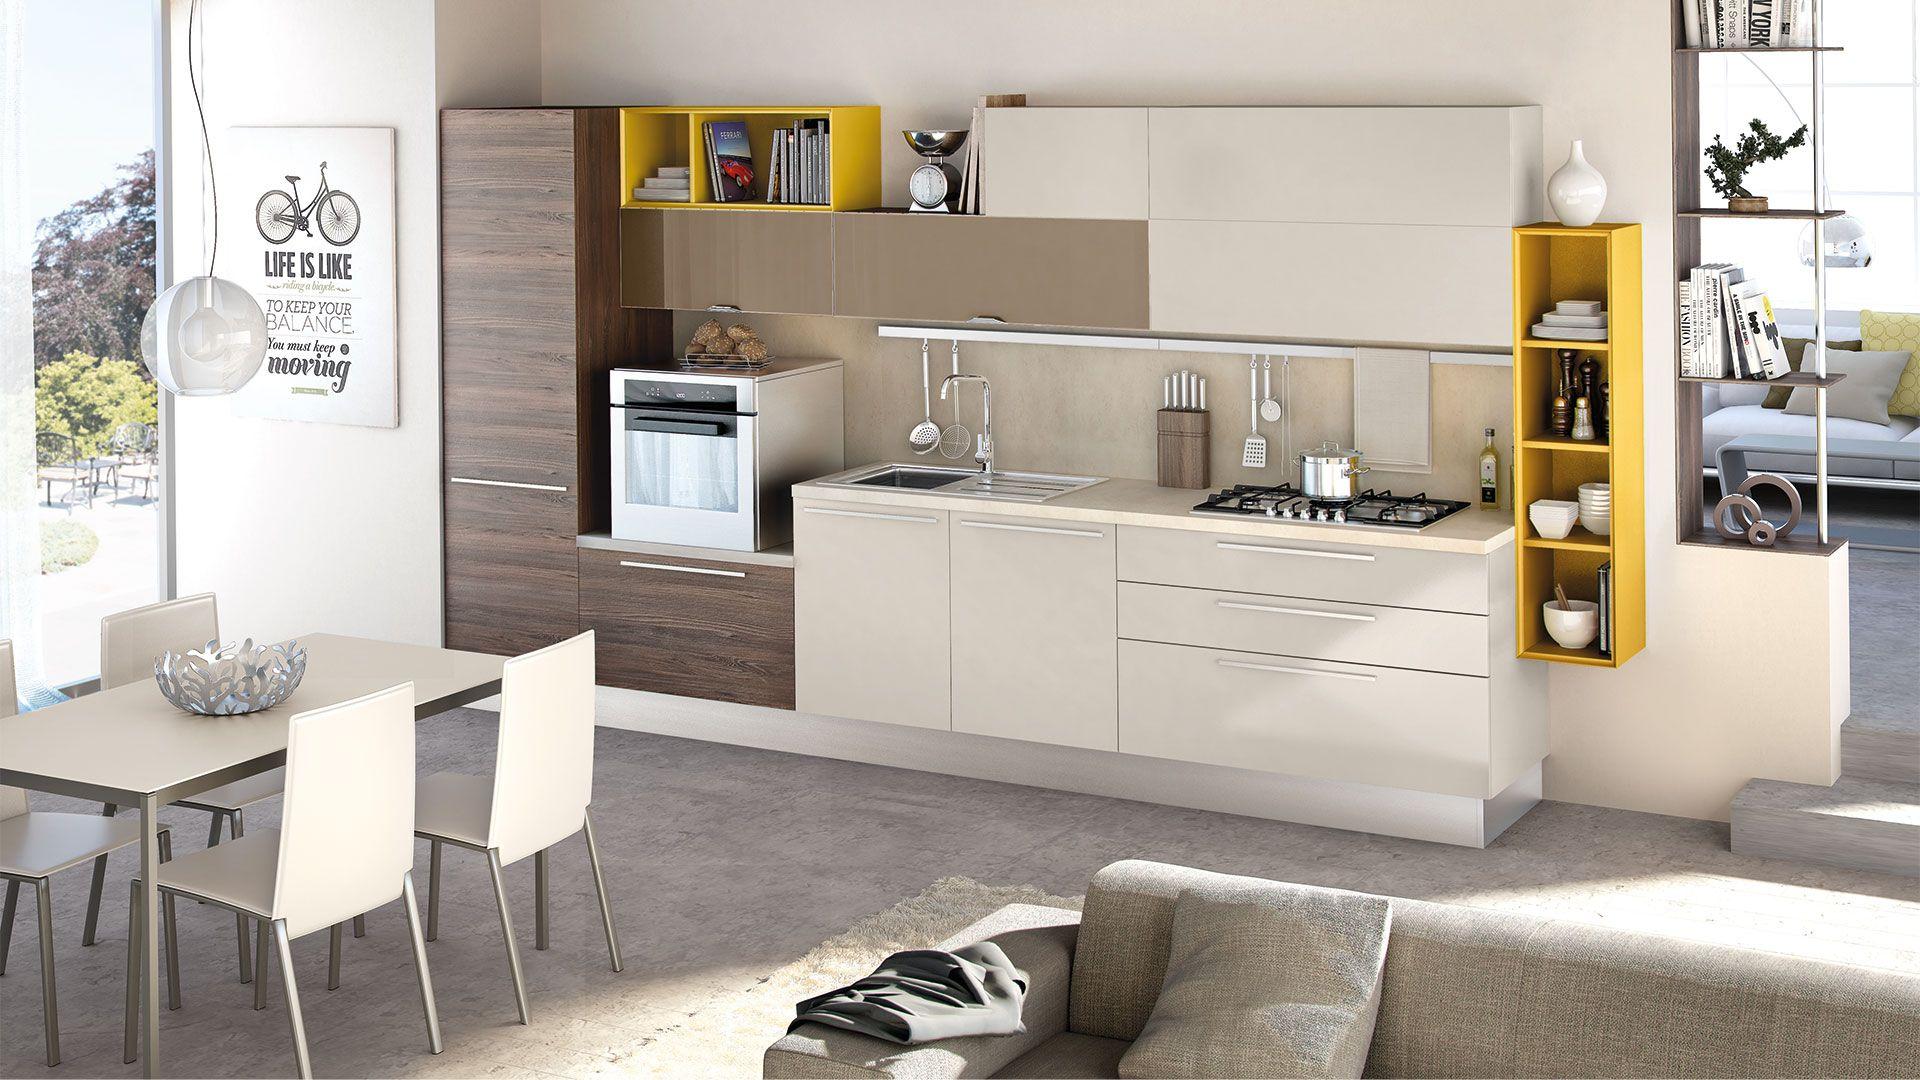 Noemi - Современные кухни - Cucine Lube   Кухня   Pinterest   Modern ...